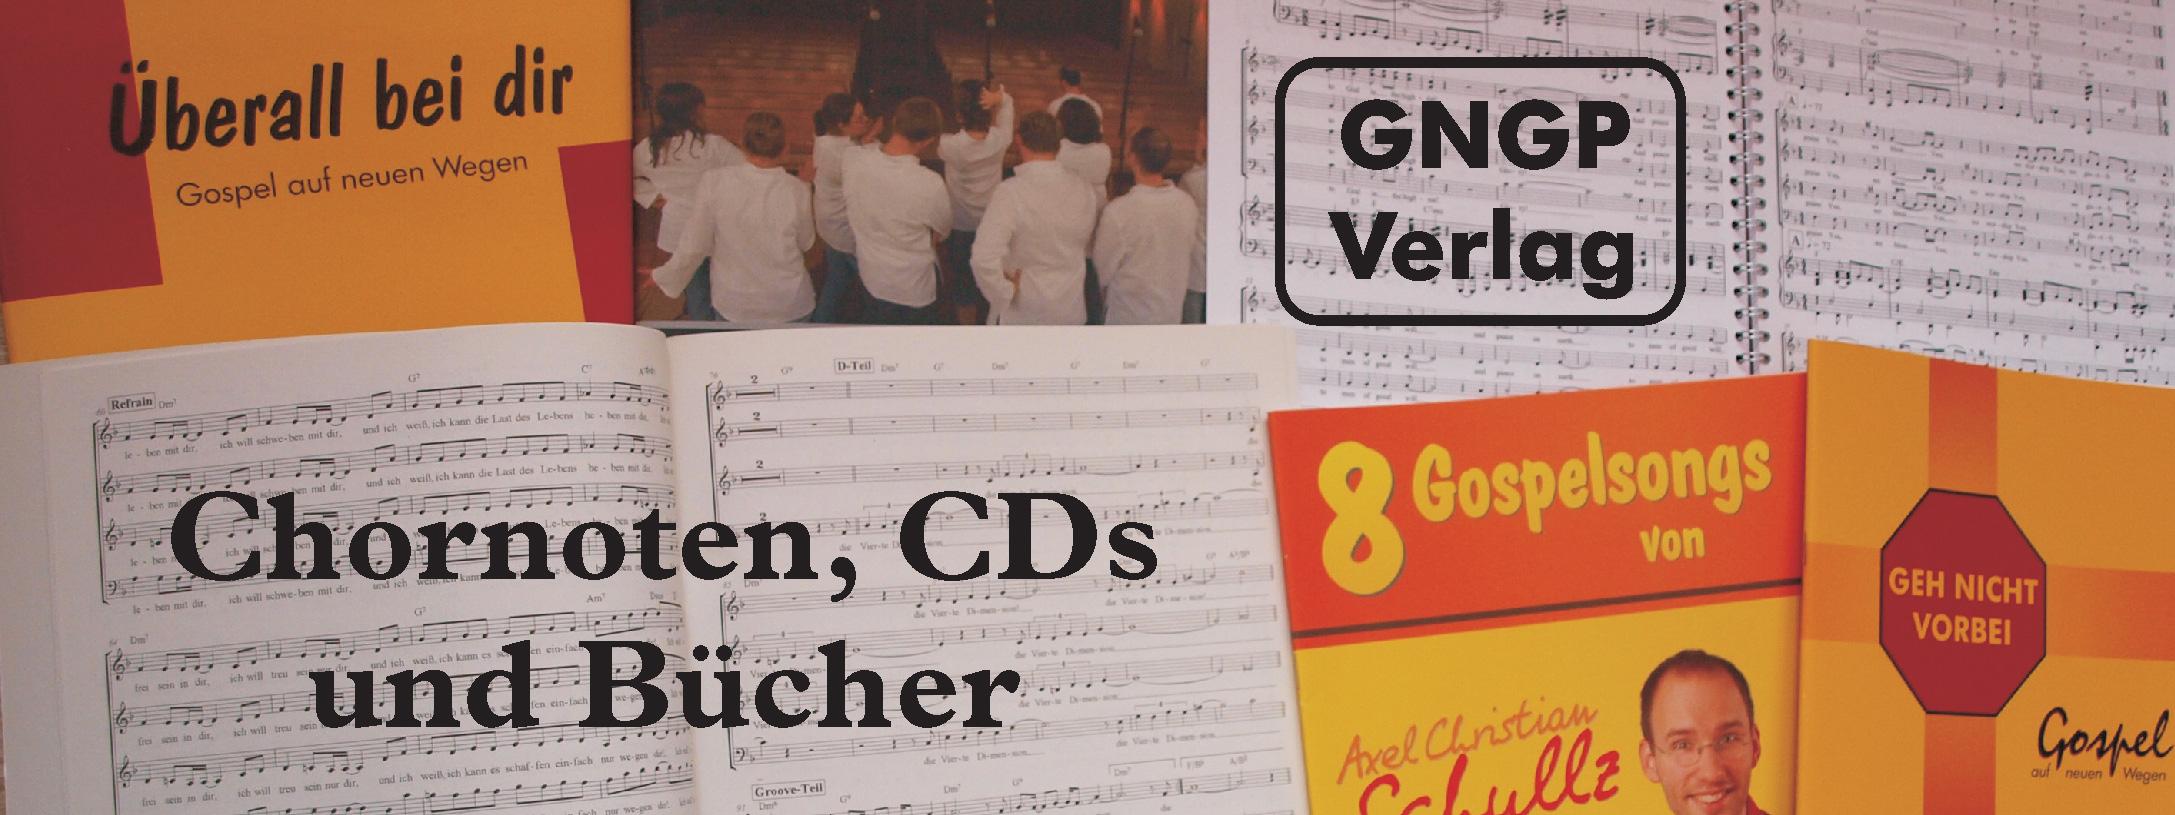 GNGP-Verlag